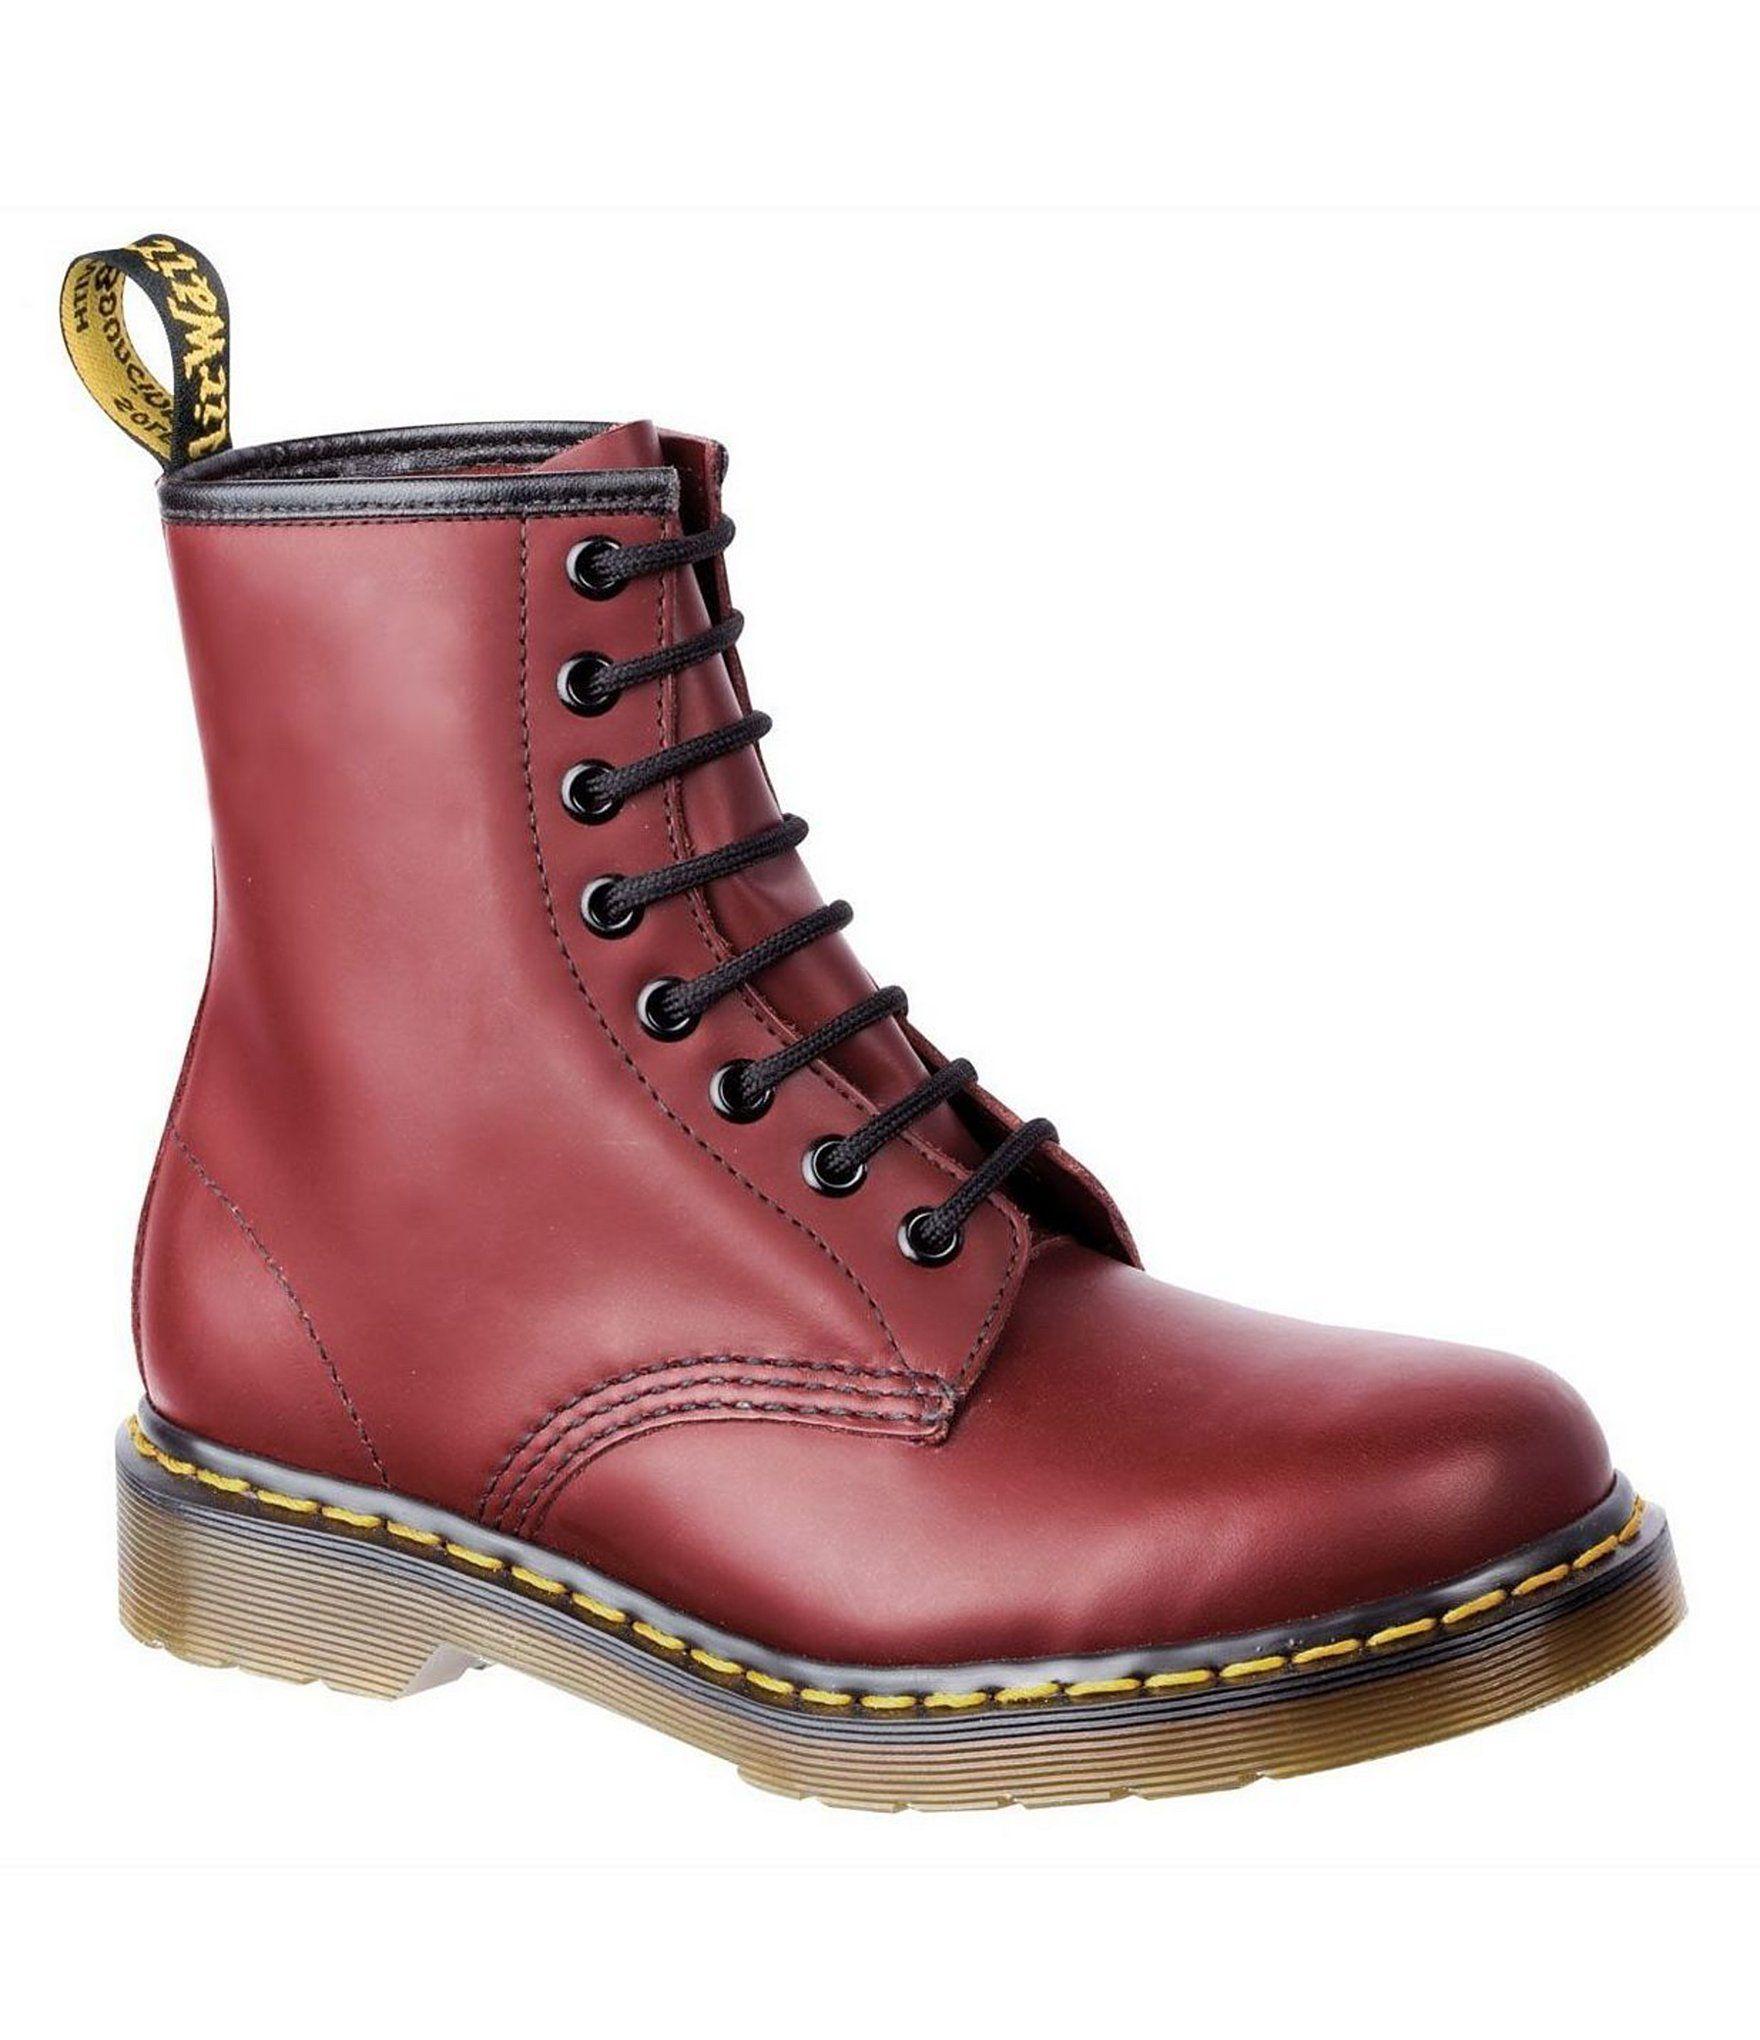 Dr. Martens 1460 Classic 8-Eye Combat Boots | Dillard's 2